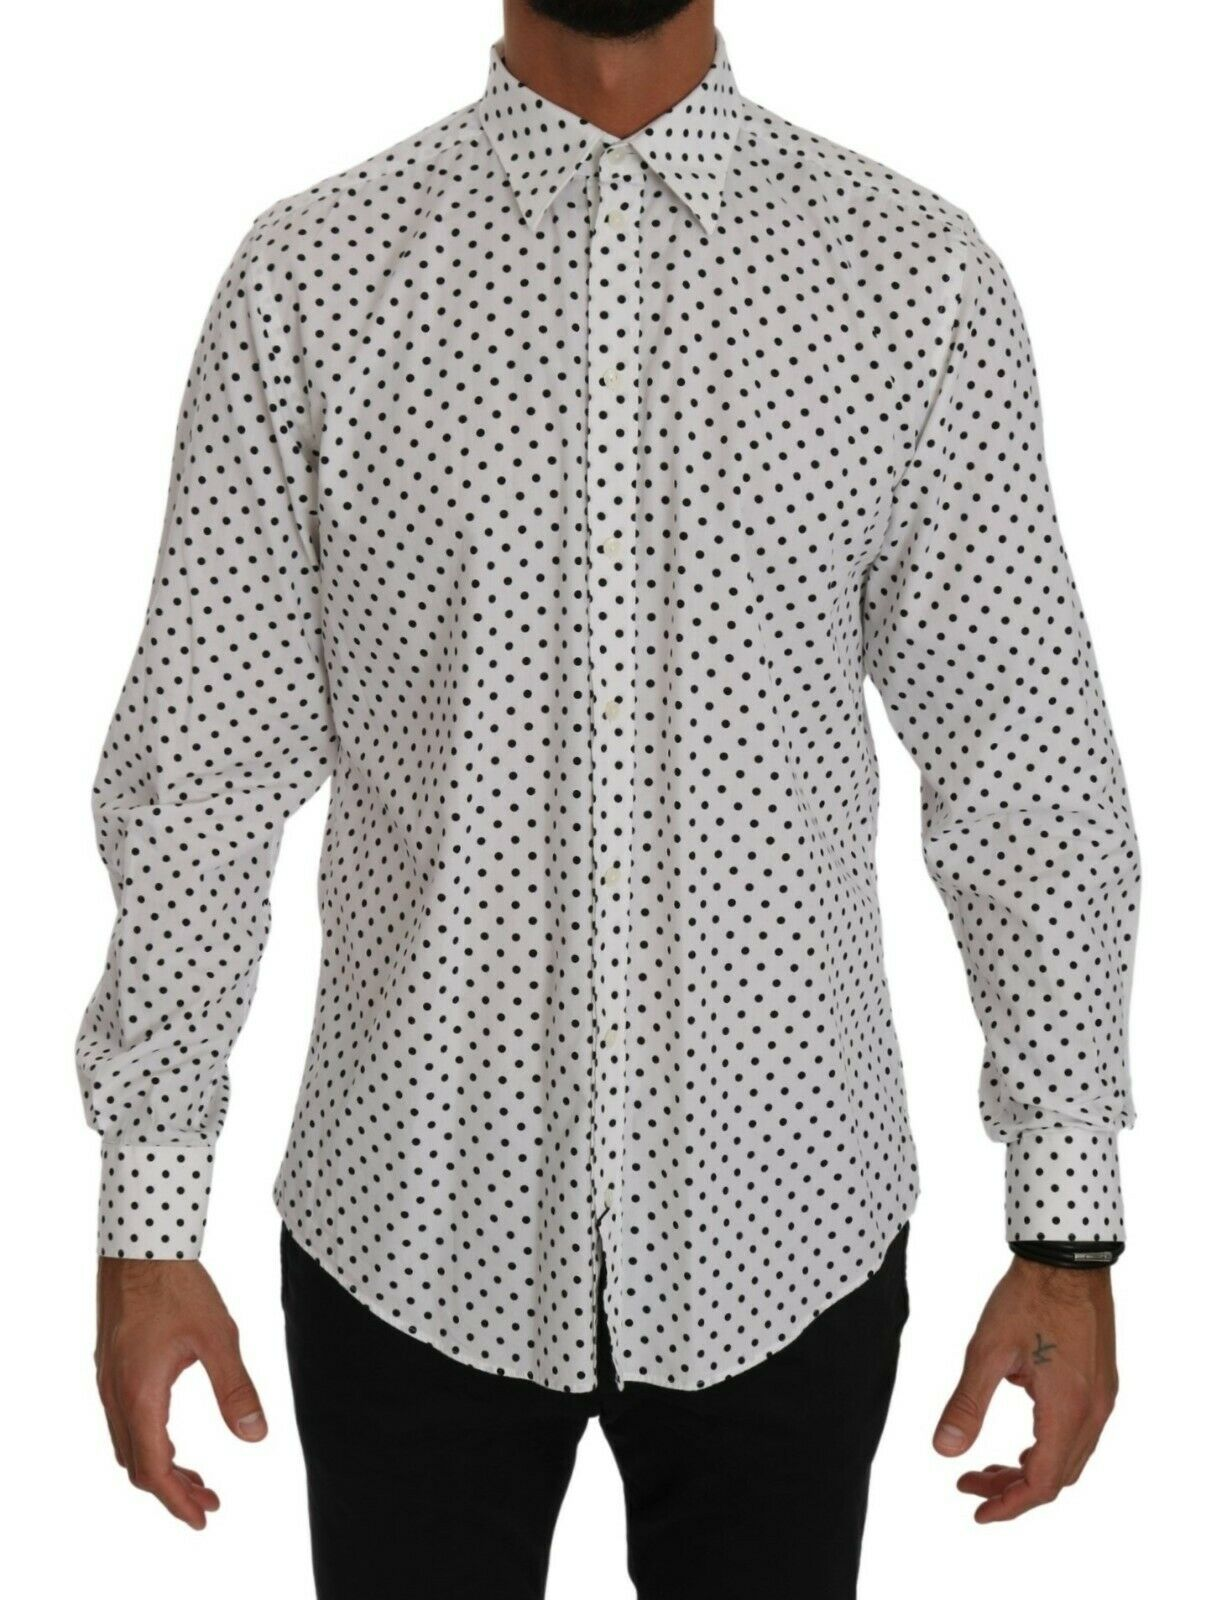 Dolce & Gabbana Men's Dotted Dress Formal MARTINI Shirt White TSH4075 - IT37 | XS